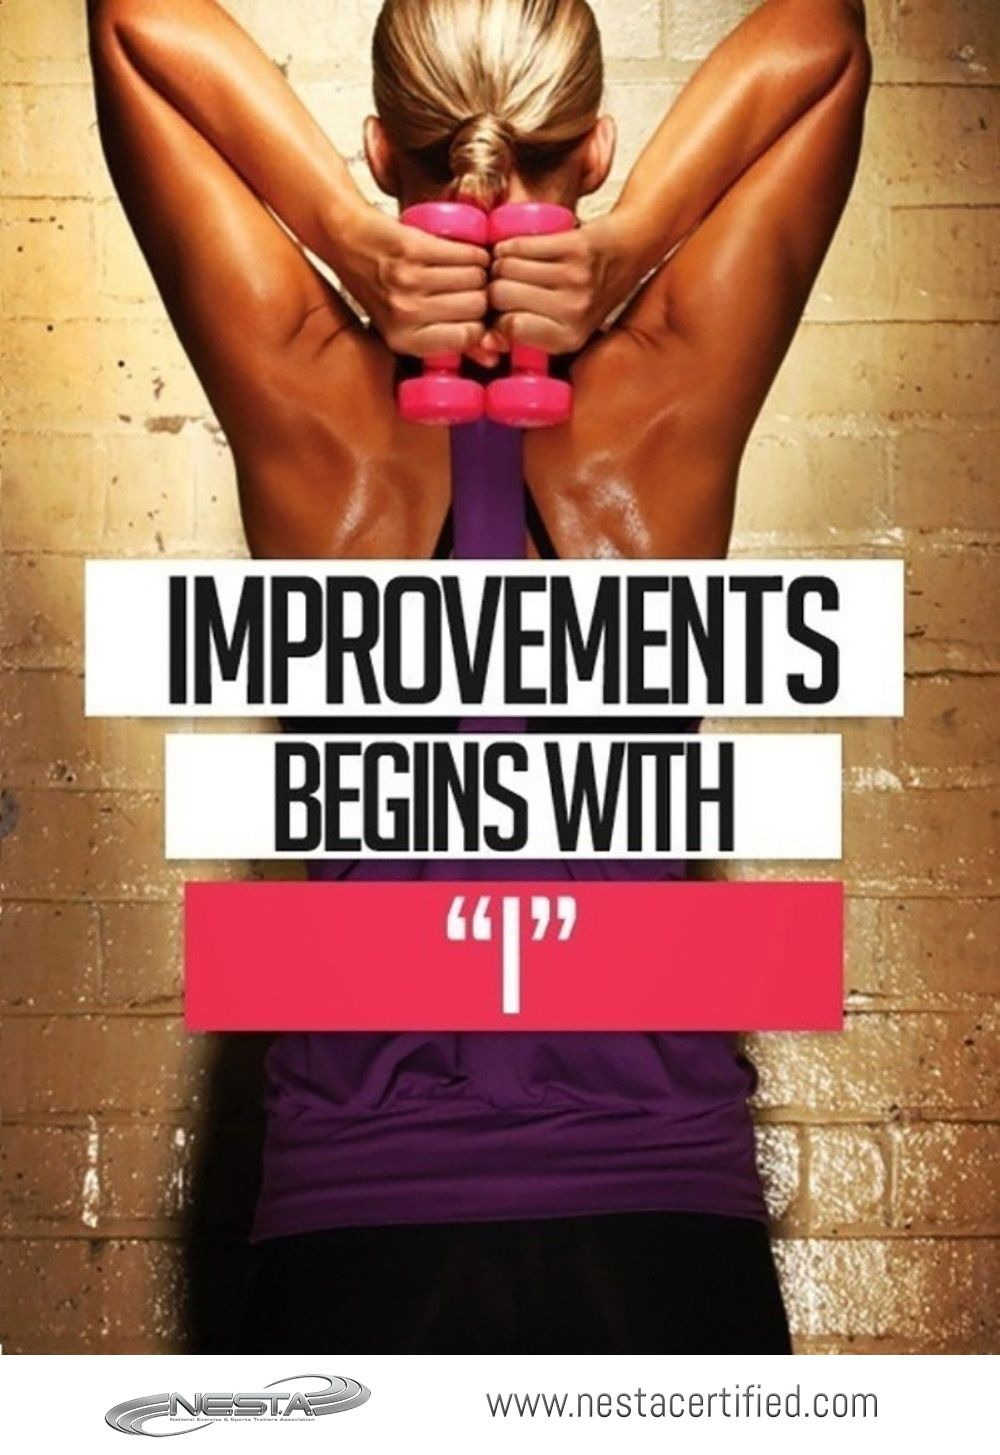 NESTA Personal Trainer Certification  Fitness Motivation